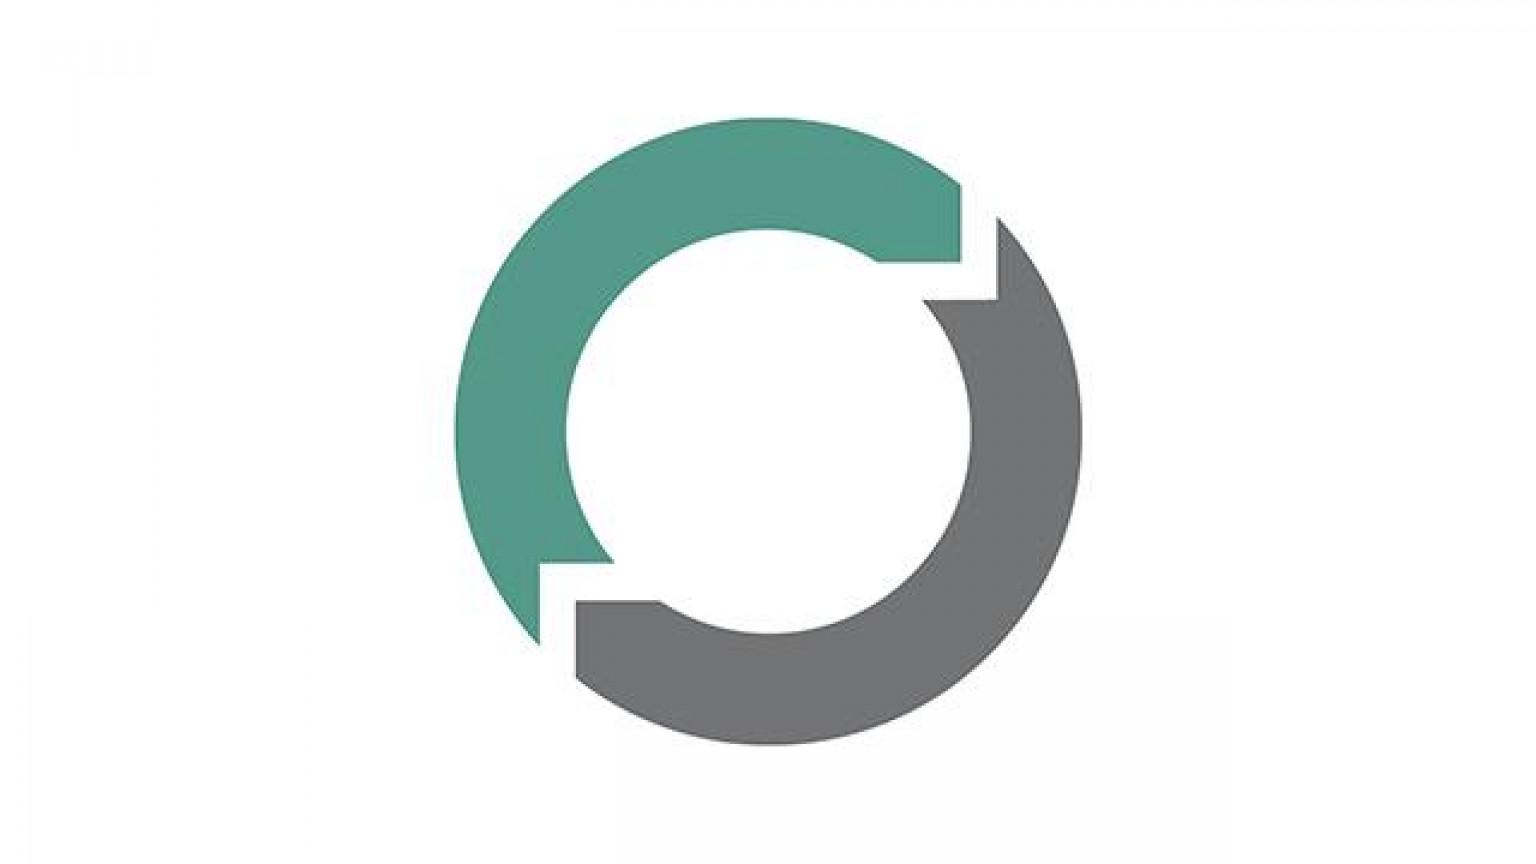 Logo of the Real Estate crowdfunding site Loanpad